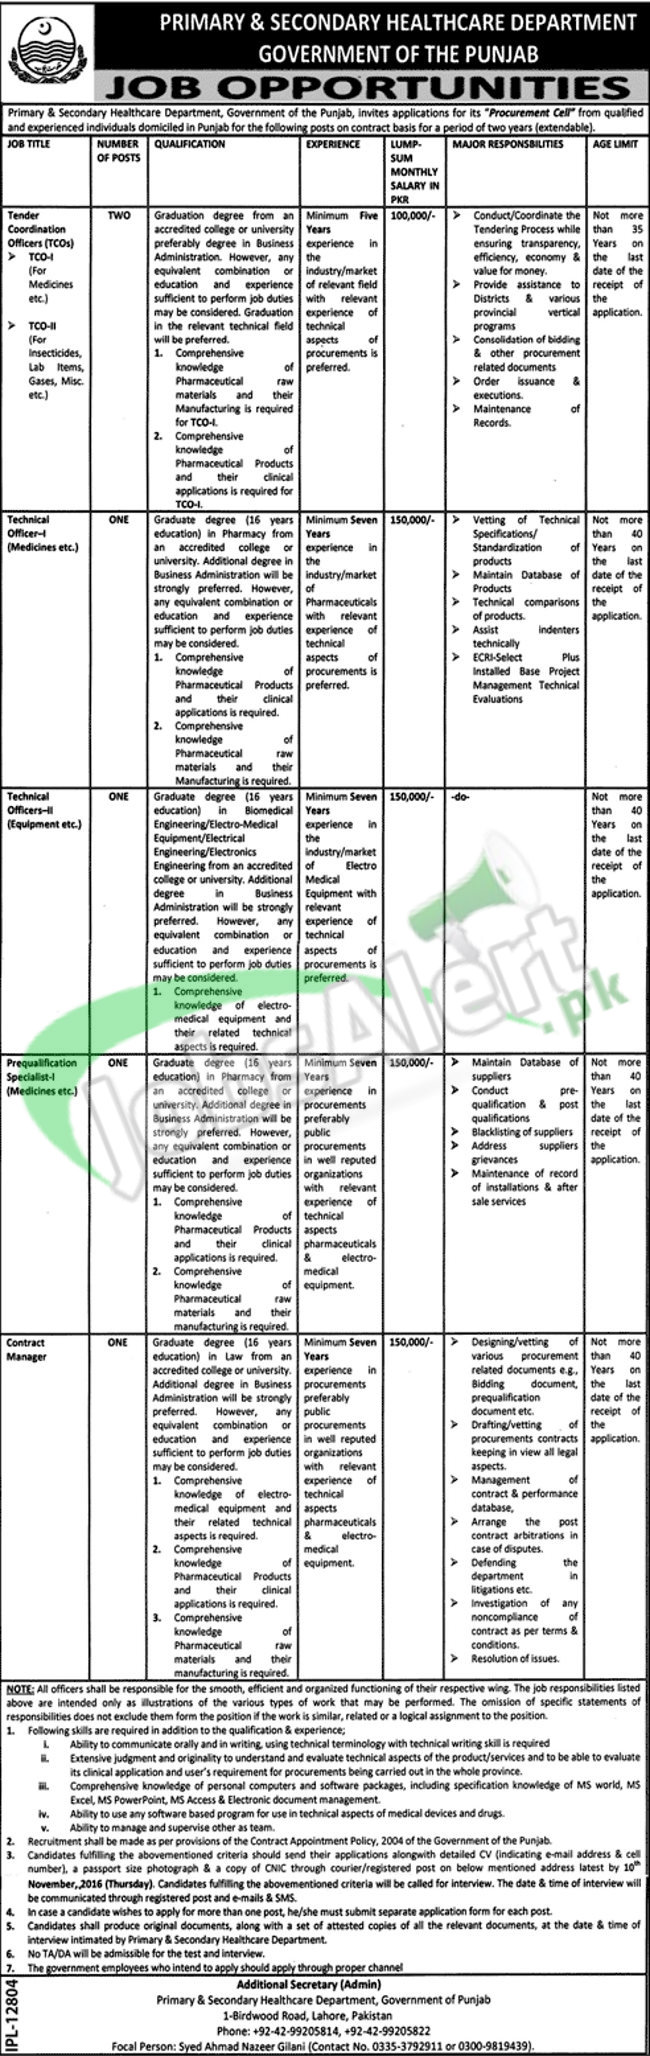 Primary & Secondary Healthcare Dpt